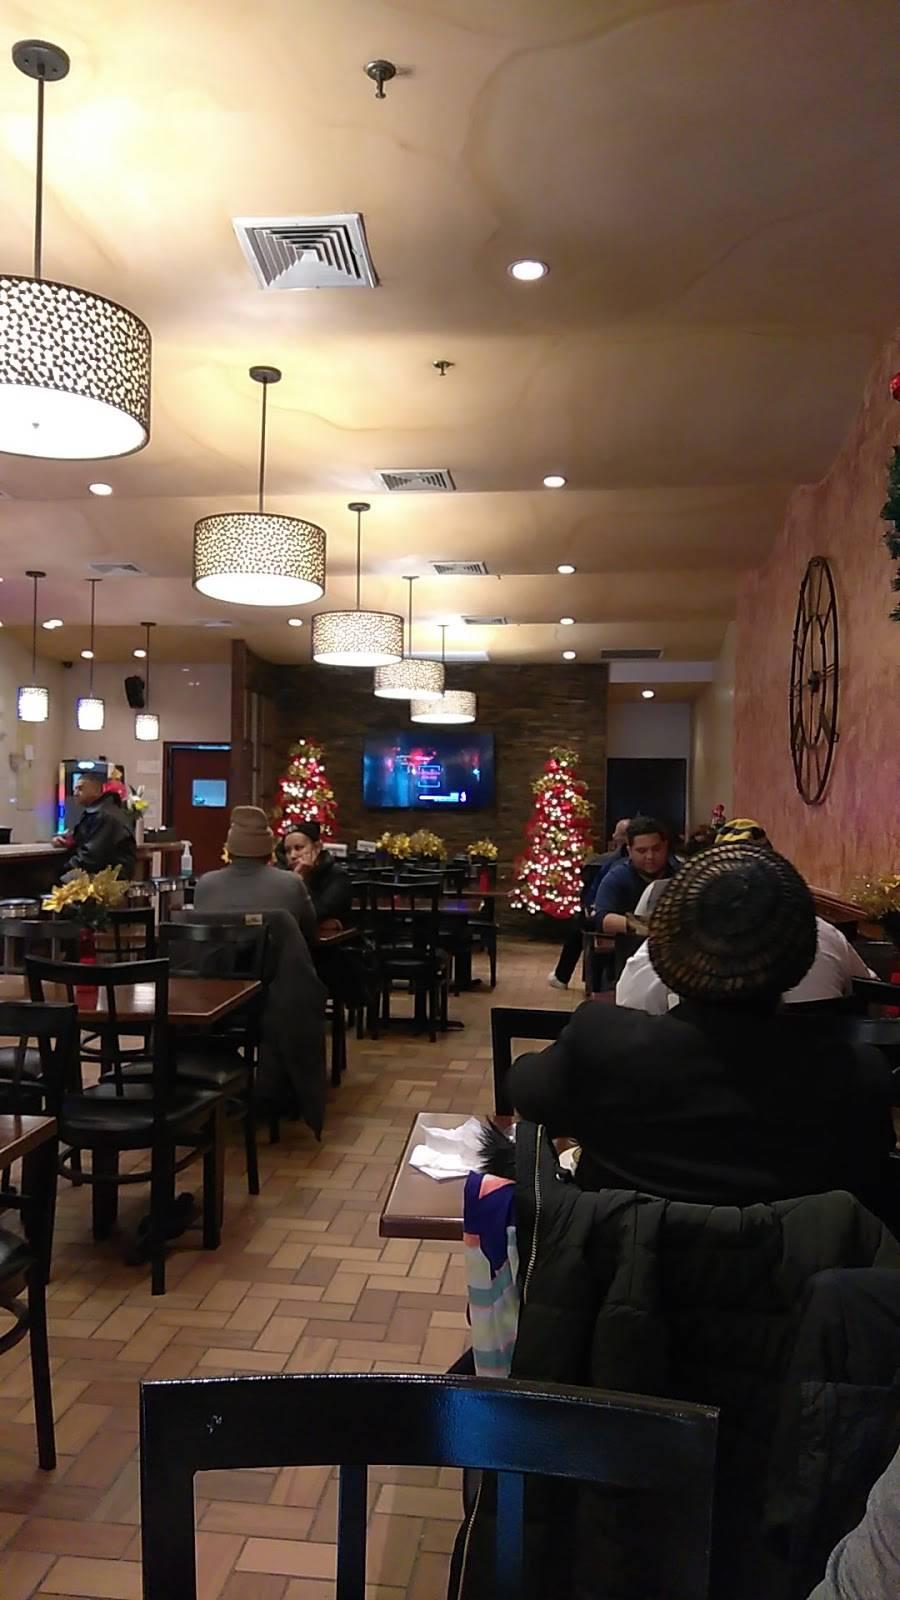 El Valle   restaurant   1304, 450 E 149th St, Bronx, NY 10455, USA   3472719192 OR +1 347-271-9192